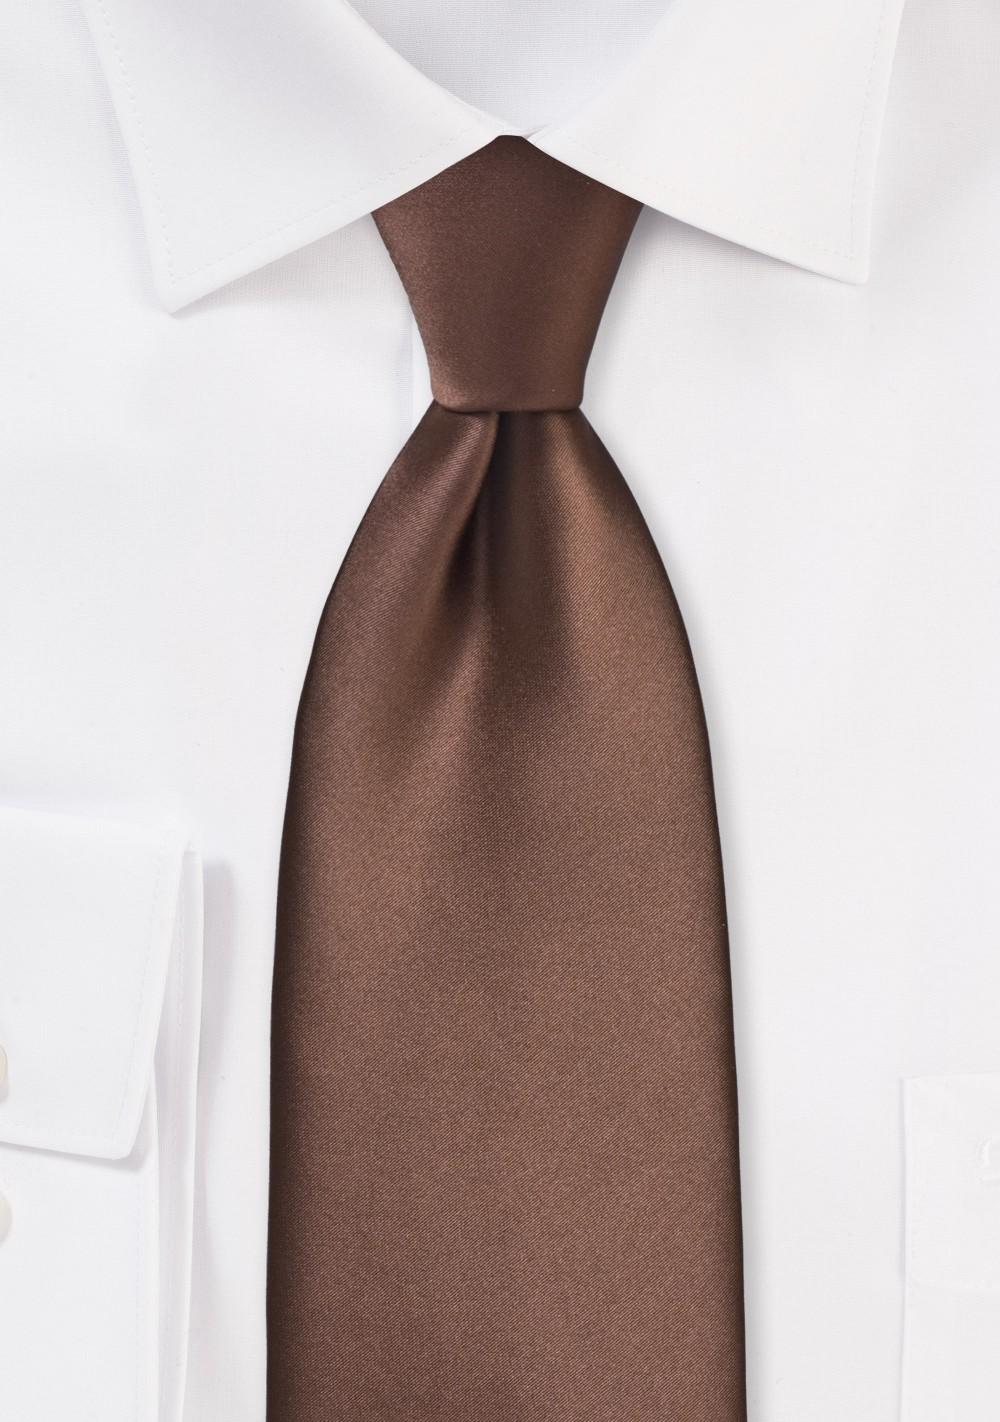 Extra Long Mens Tie in Mocha Brown